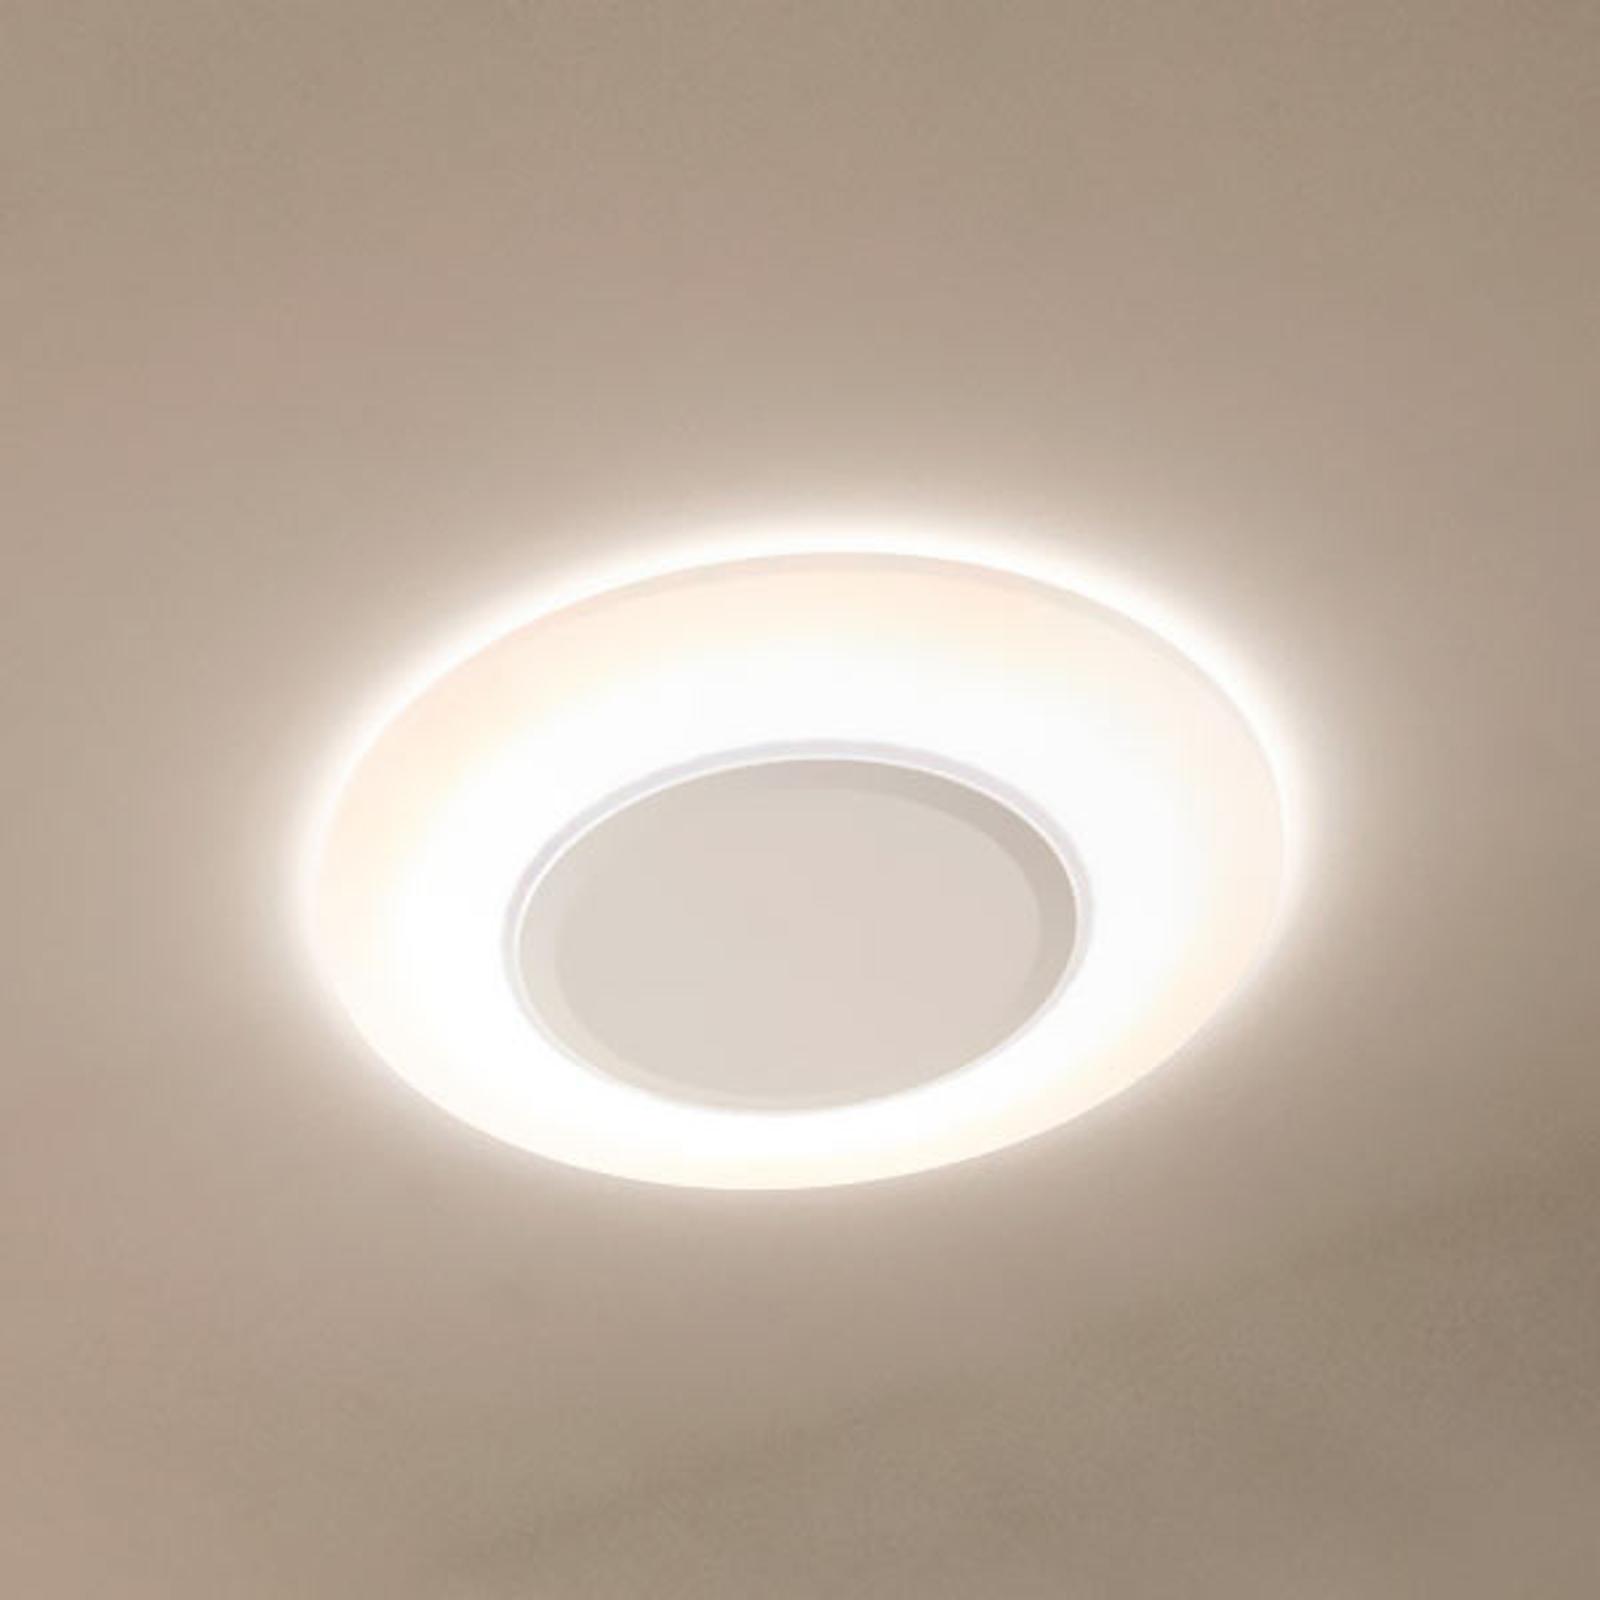 LEDVANCE Ring LED plafondlamp, wit, 28 cm